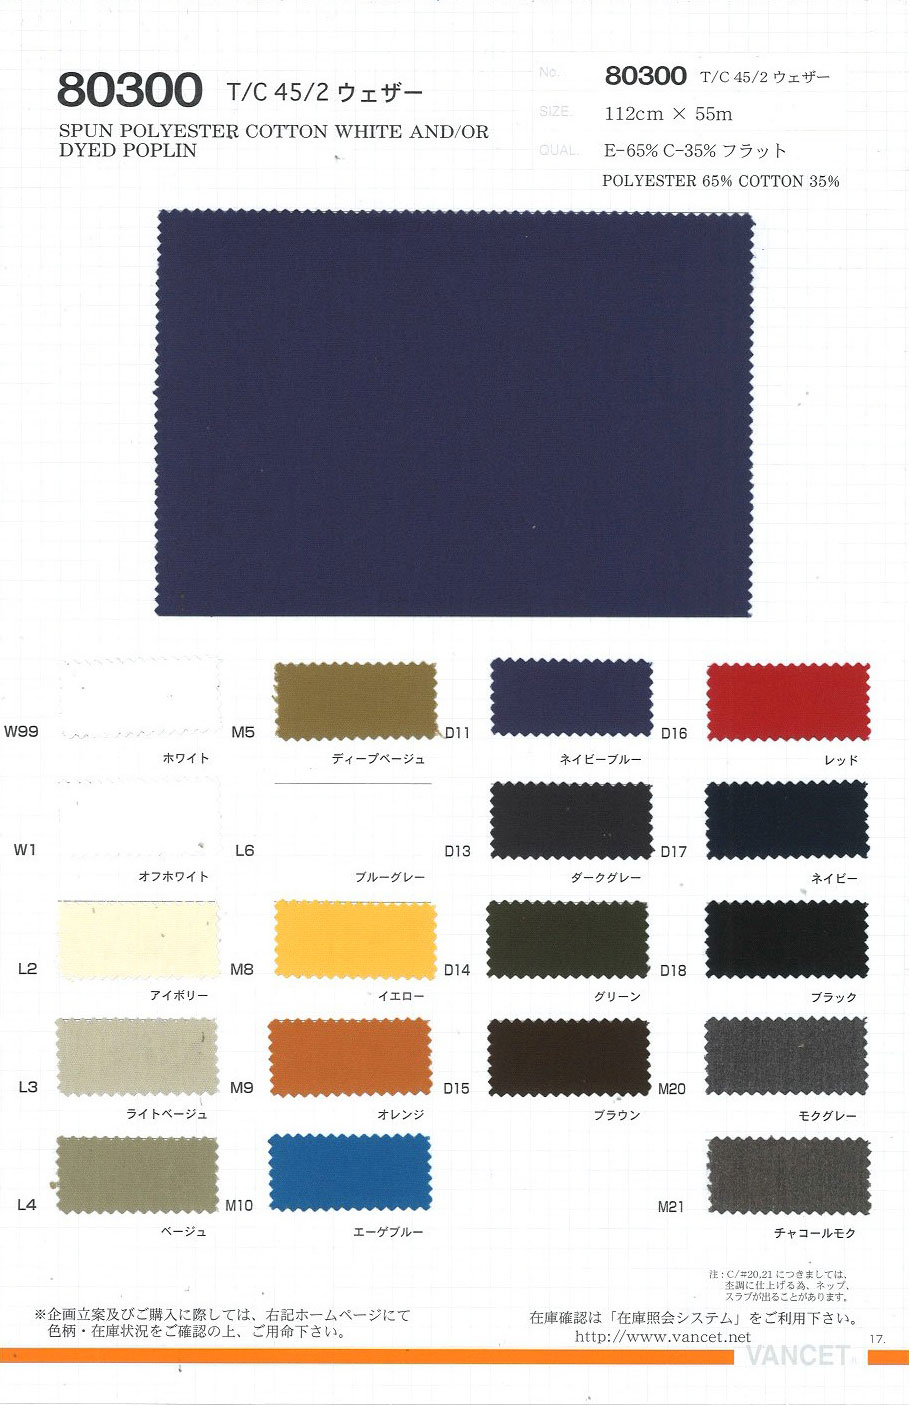 80300 T/C 45/2 ウェザー[生地] VANCET/オークラ商事 - ApparelX アパレル資材卸通販